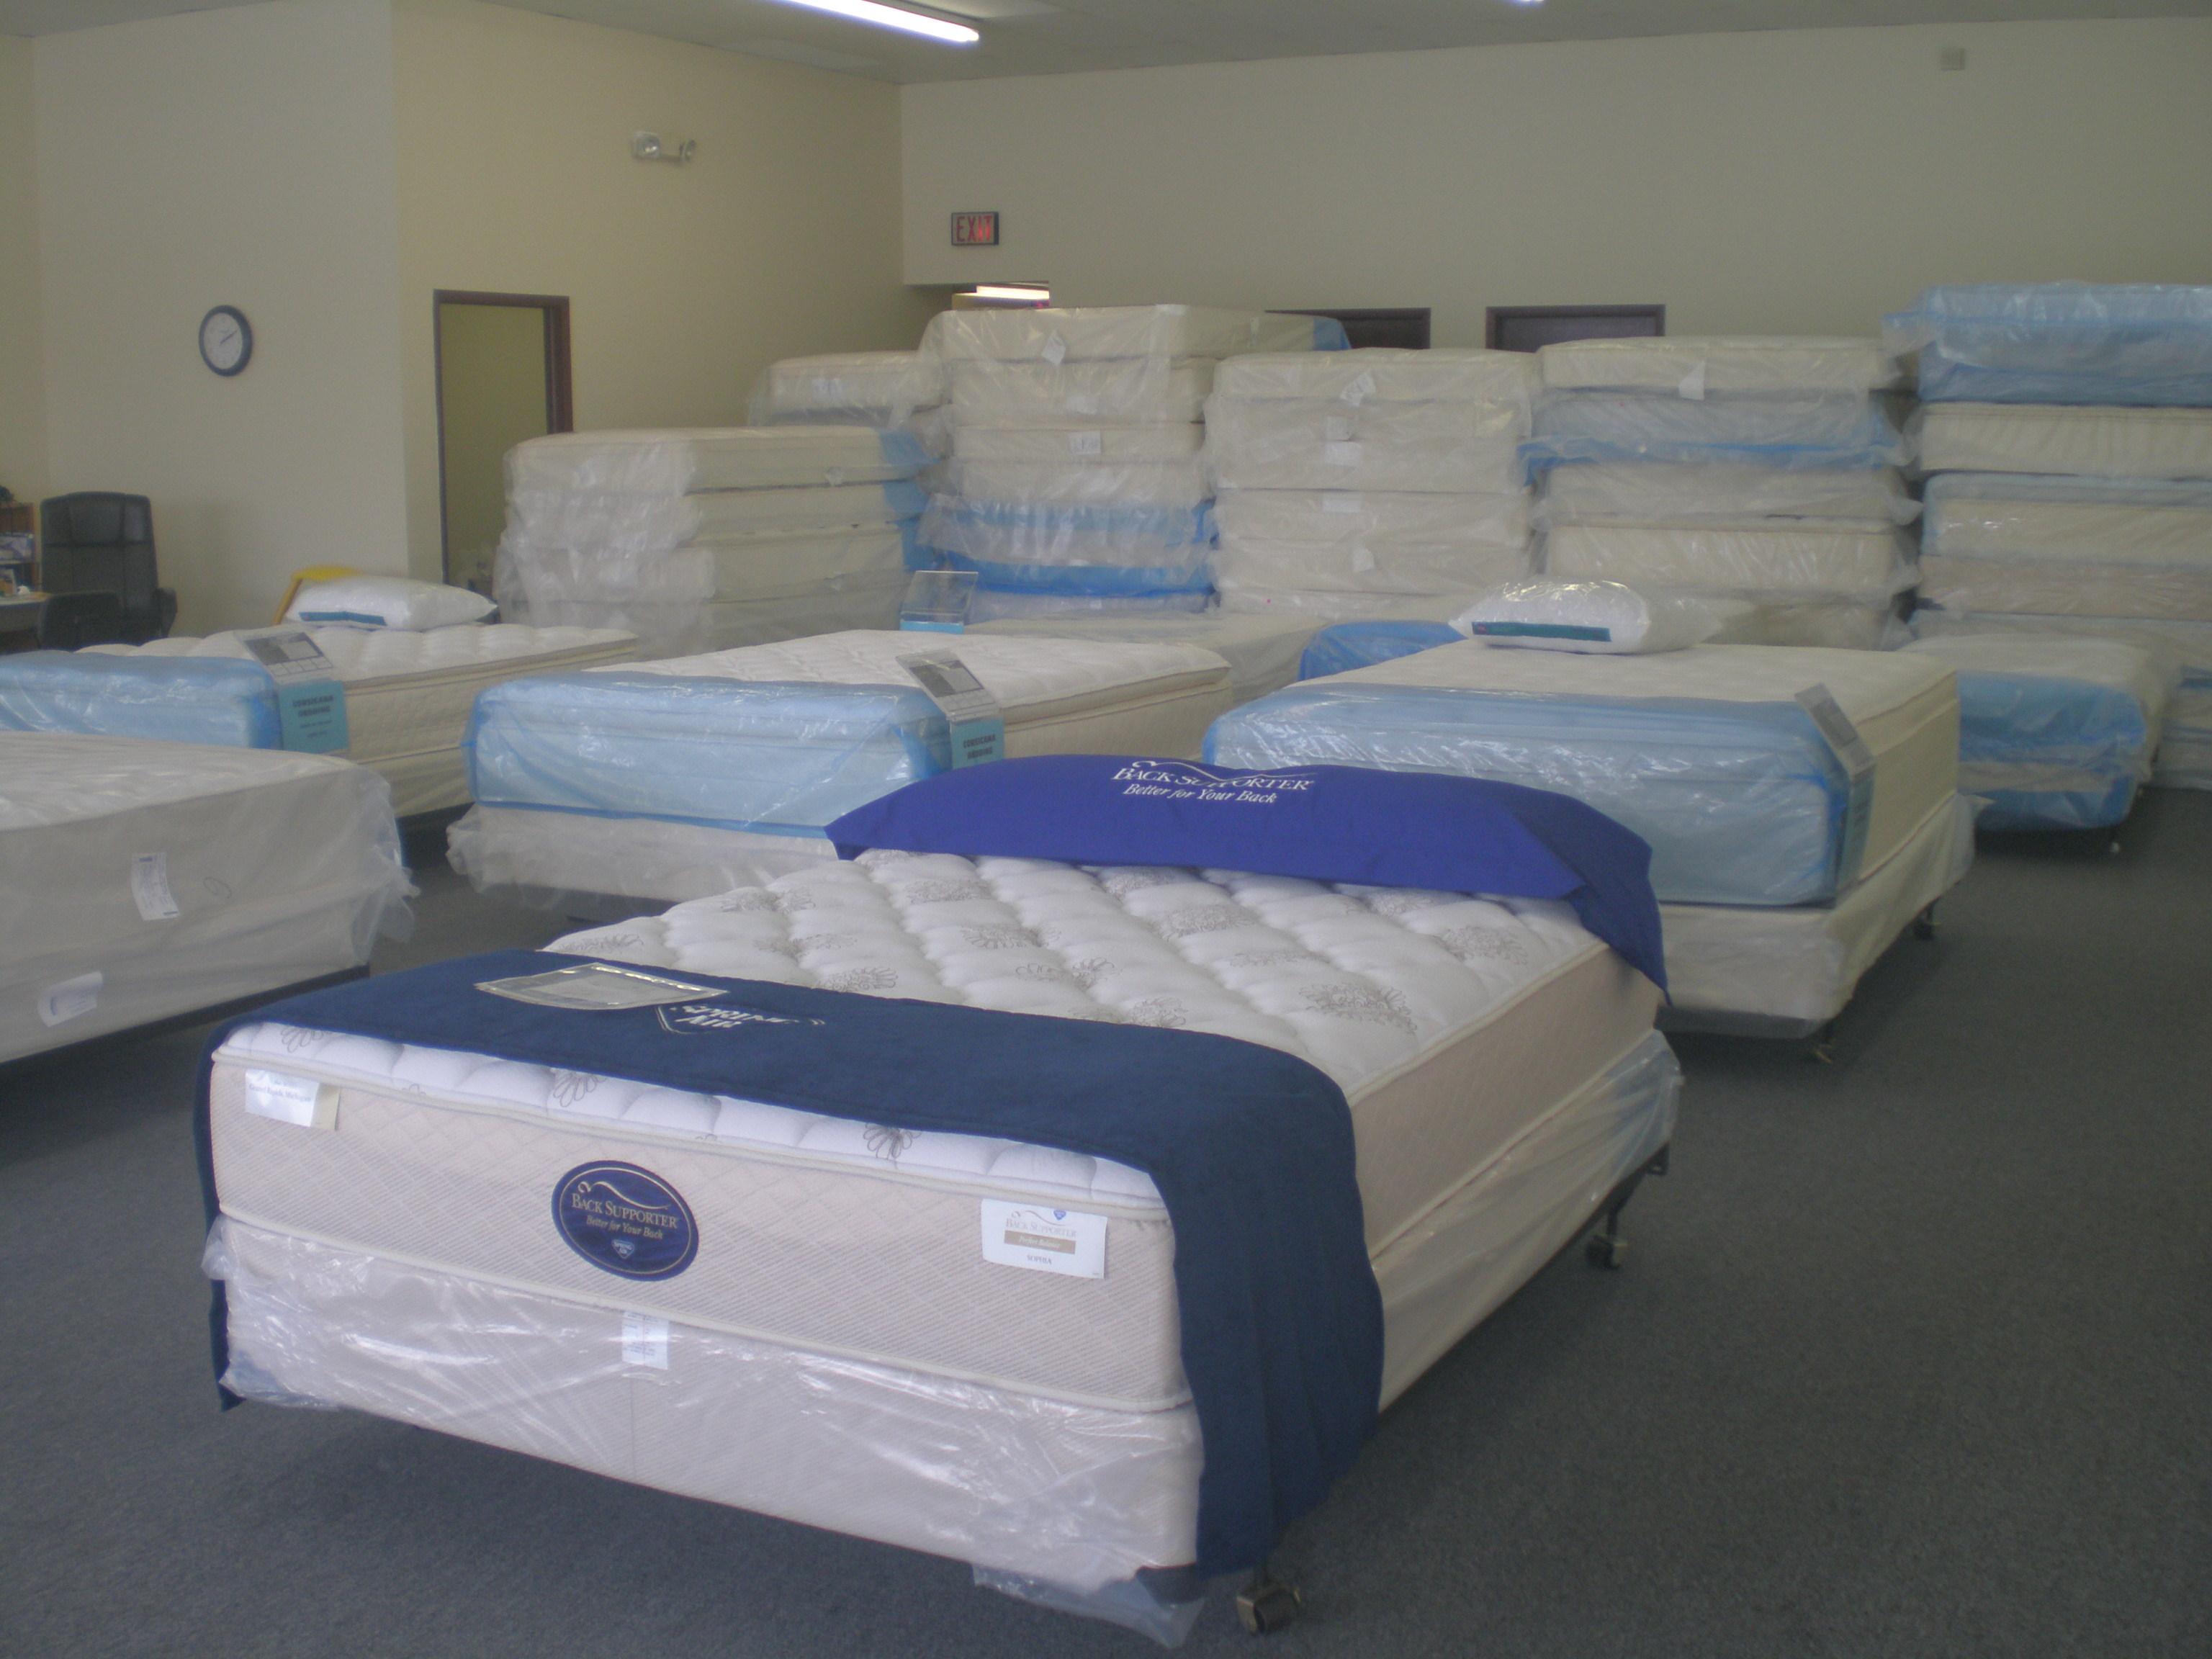 s outlet yp dearborn com restonic mattress reviews mi rd telegraph mip heights